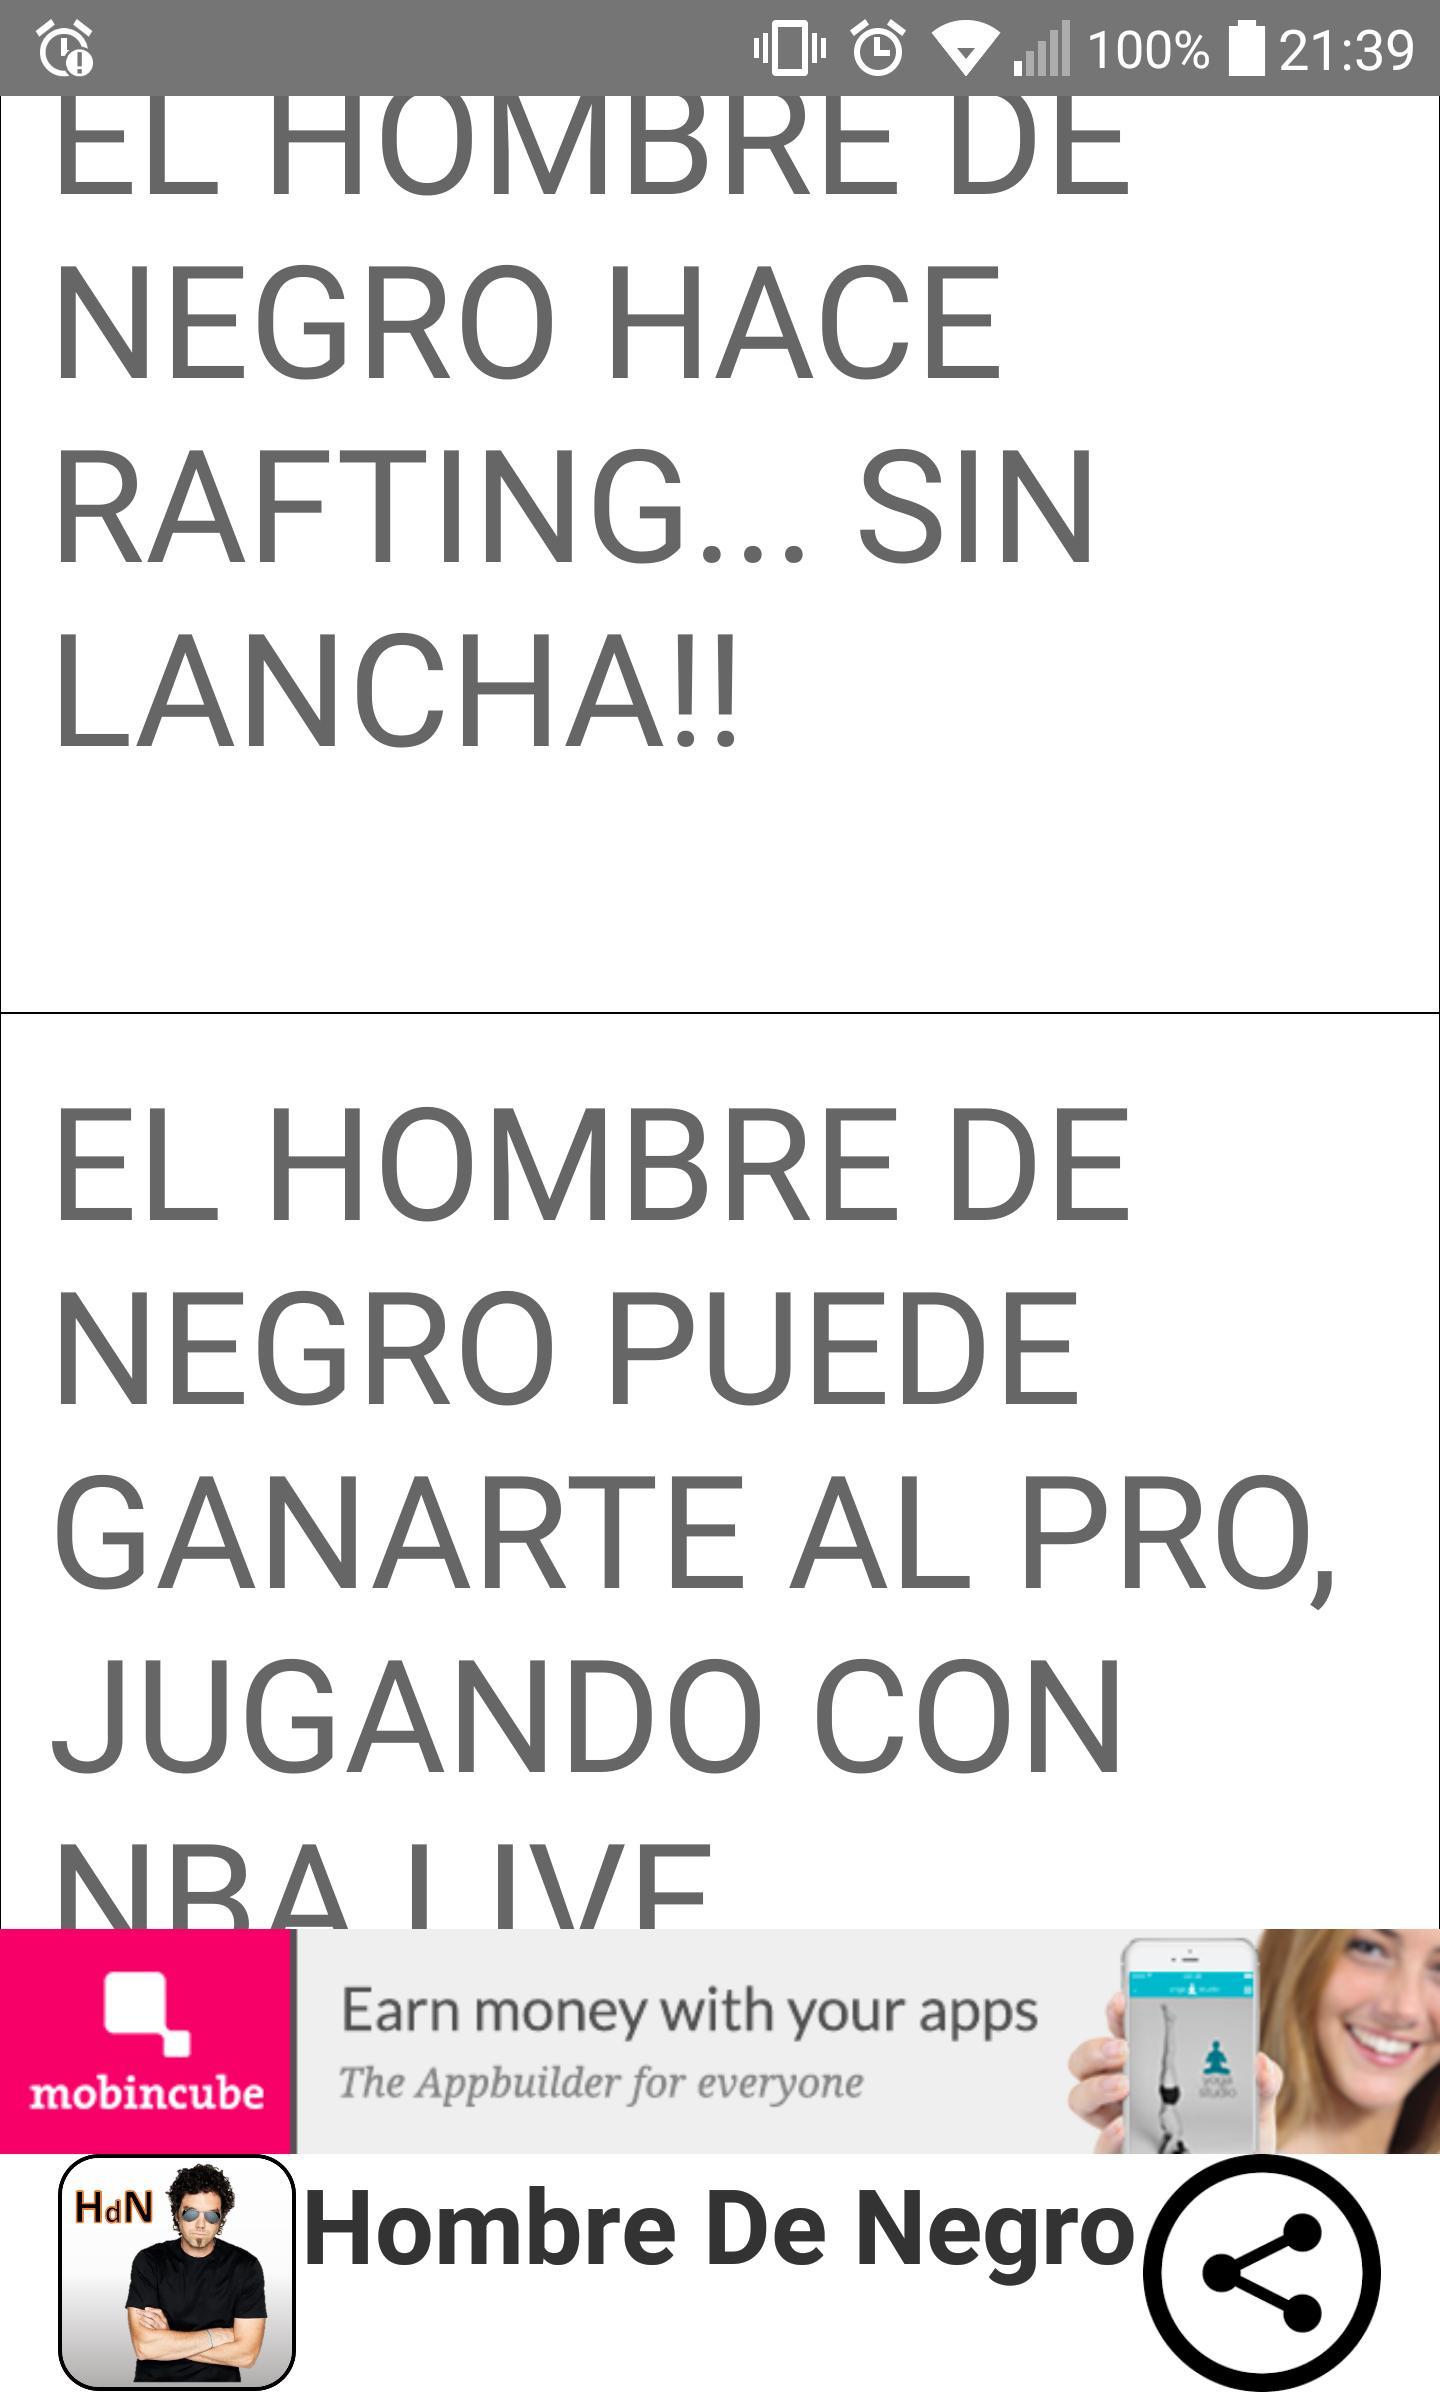 Frases Del Hombre De Negro For Android Apk Download